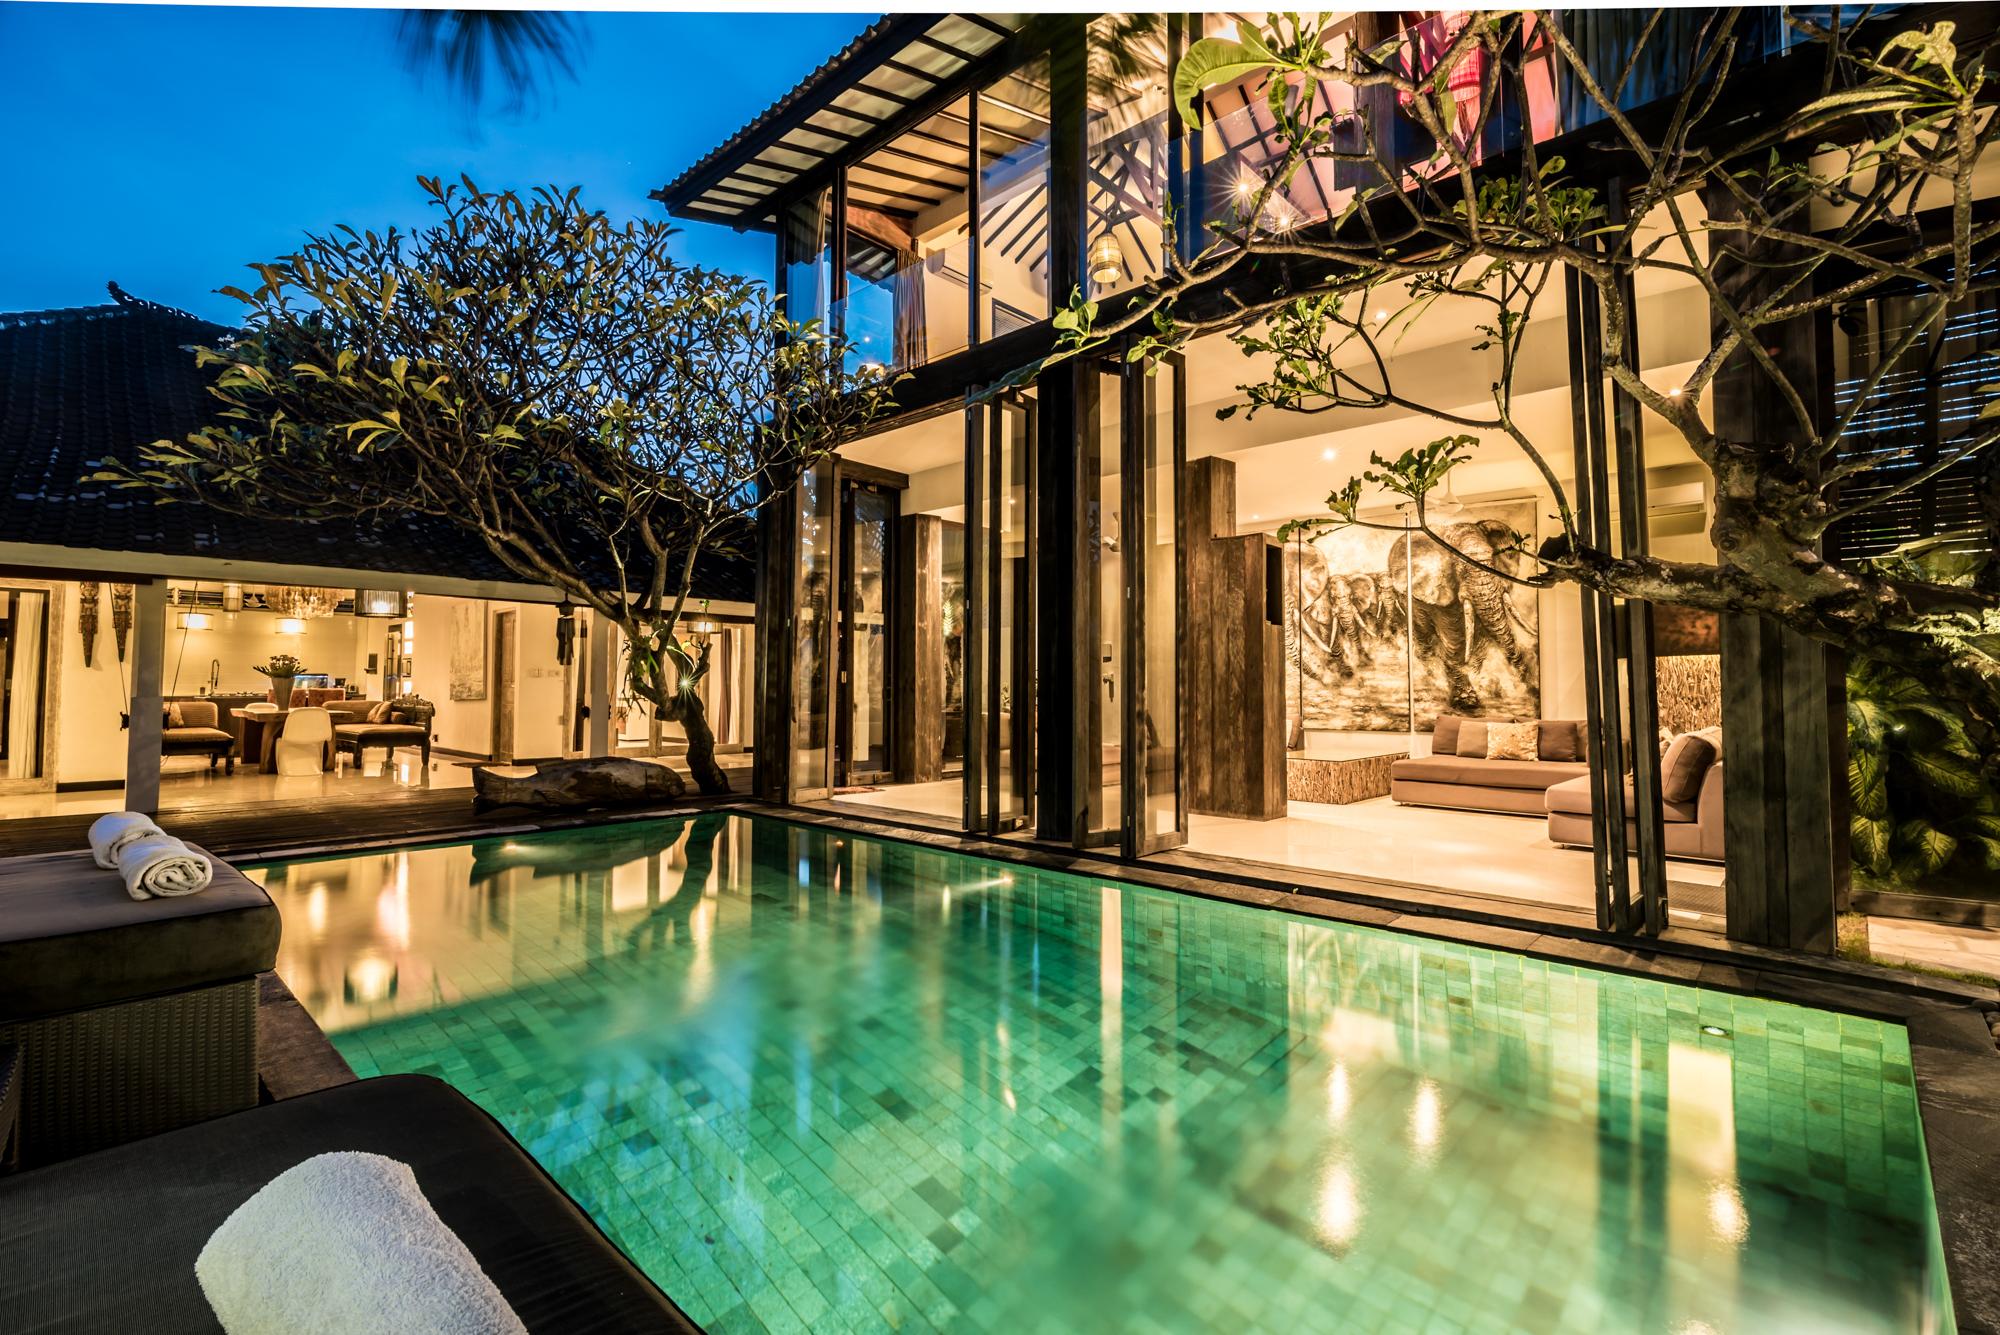 Luxury Spacious Villa 4 Bed In Centre Seminyak Villas For Rent In Seminyak Bali Indonesia